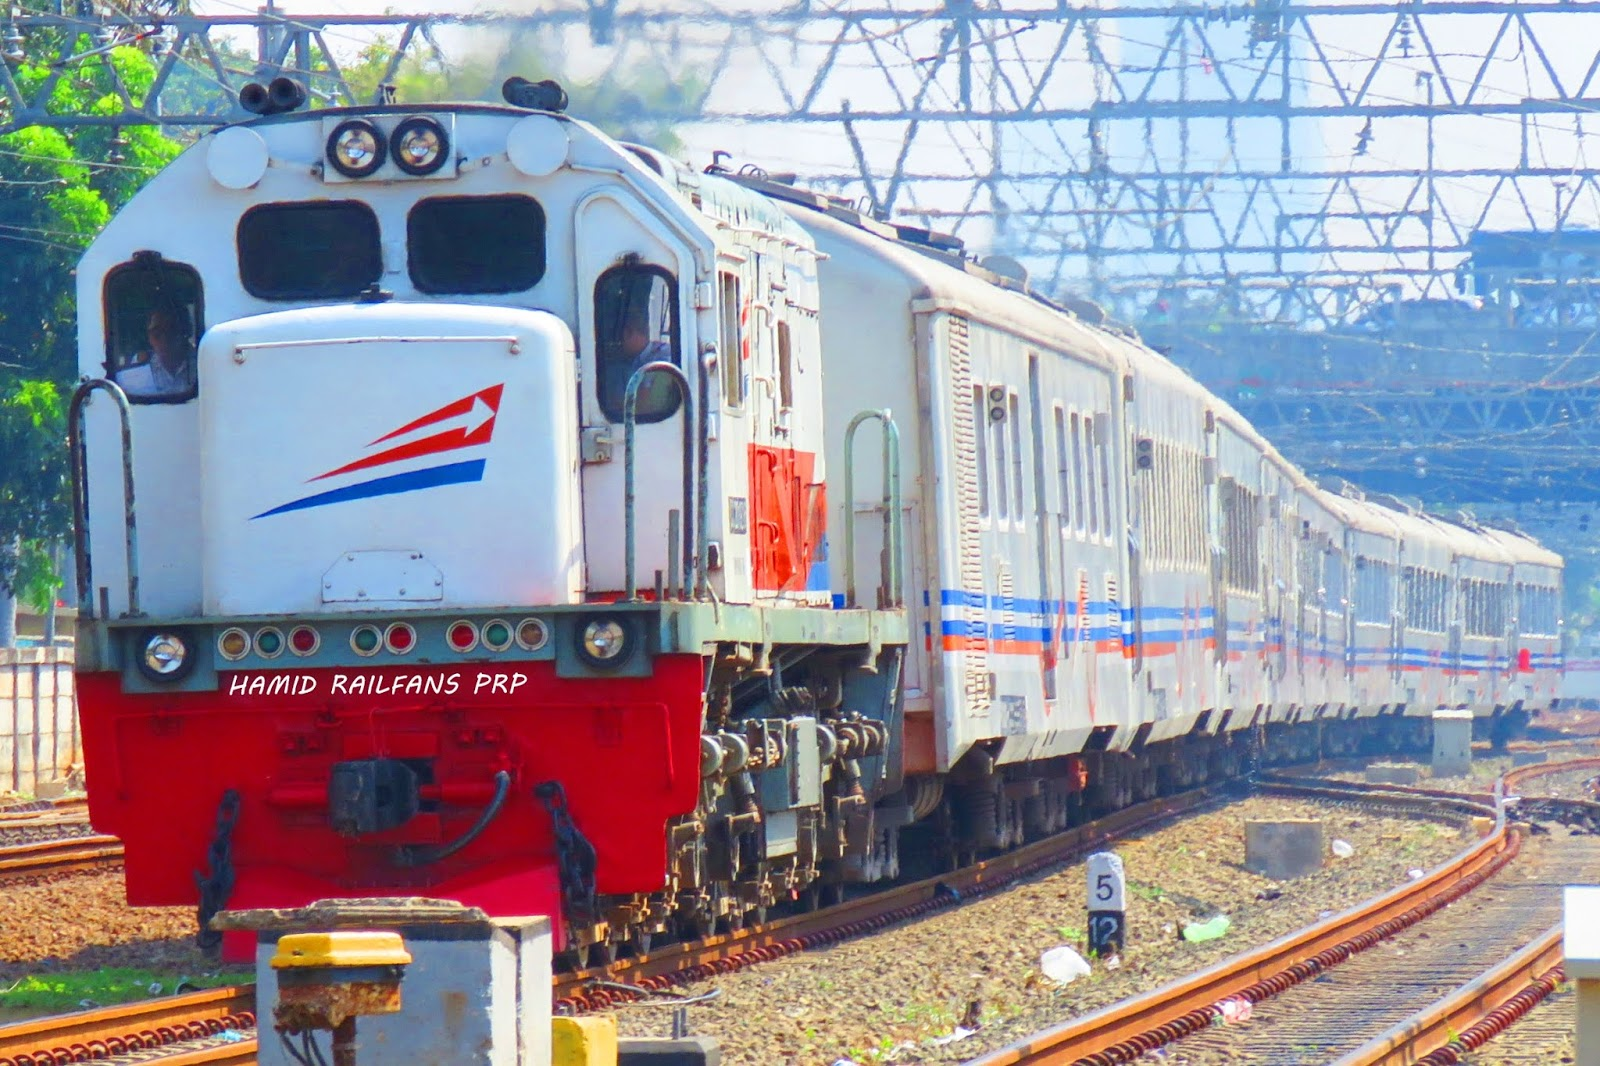 Jadwal Kereta Api Argo Jati Tambahan 2019 Hamid Railfans Prp